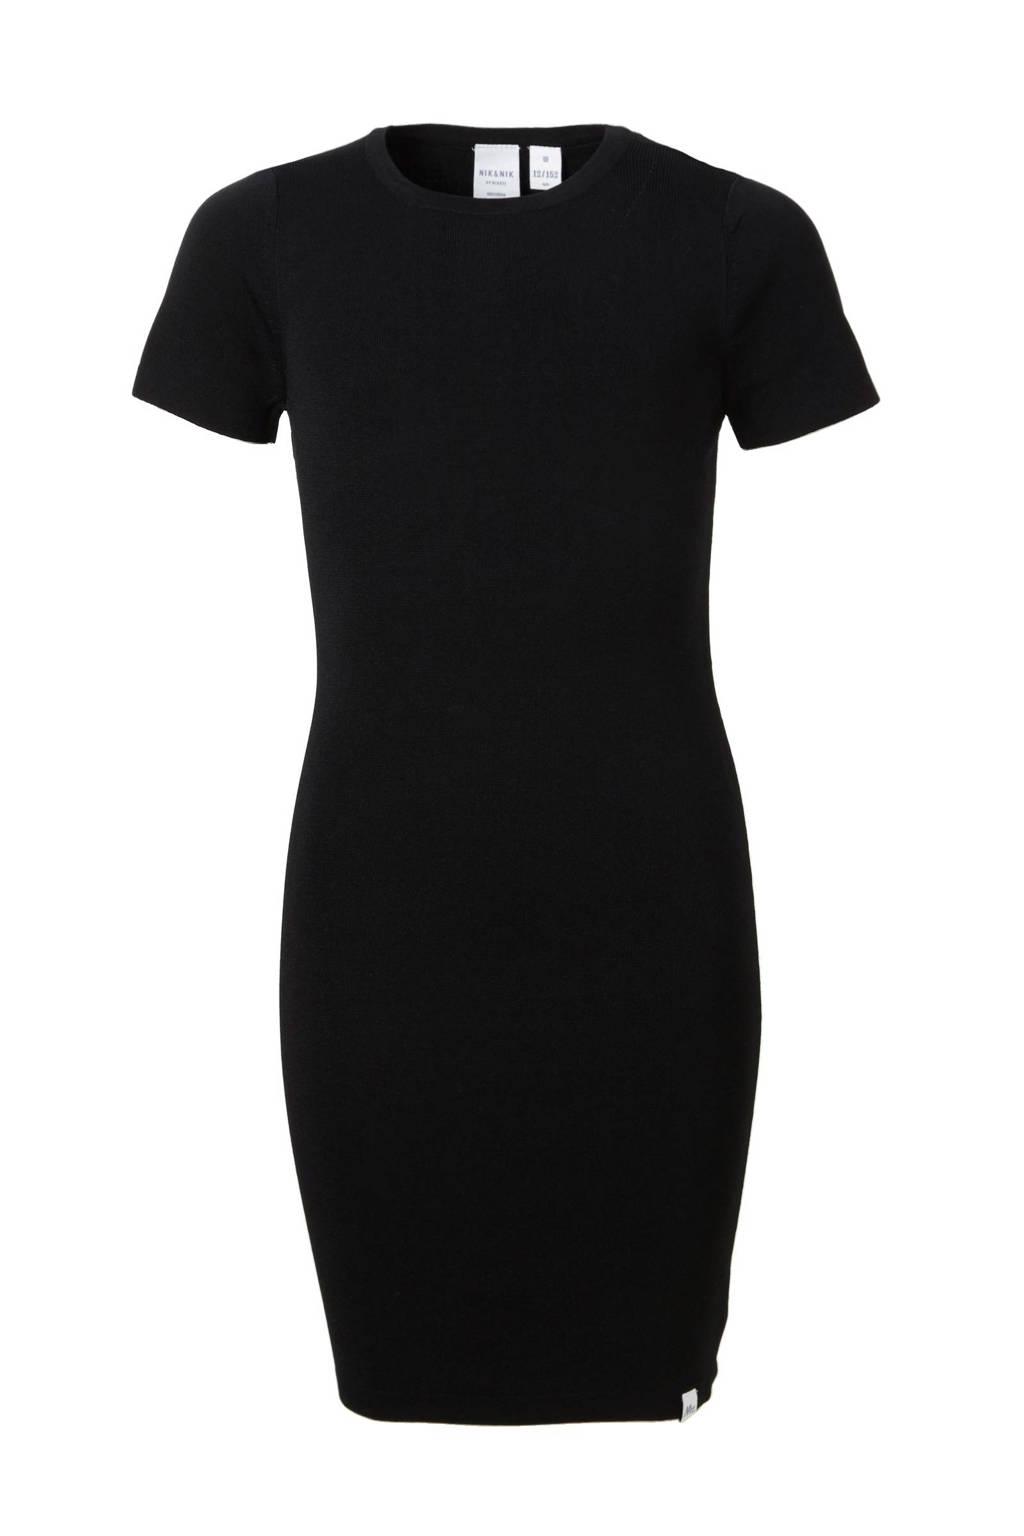 NIK&NIK jurk Jolie zwart, Zwart